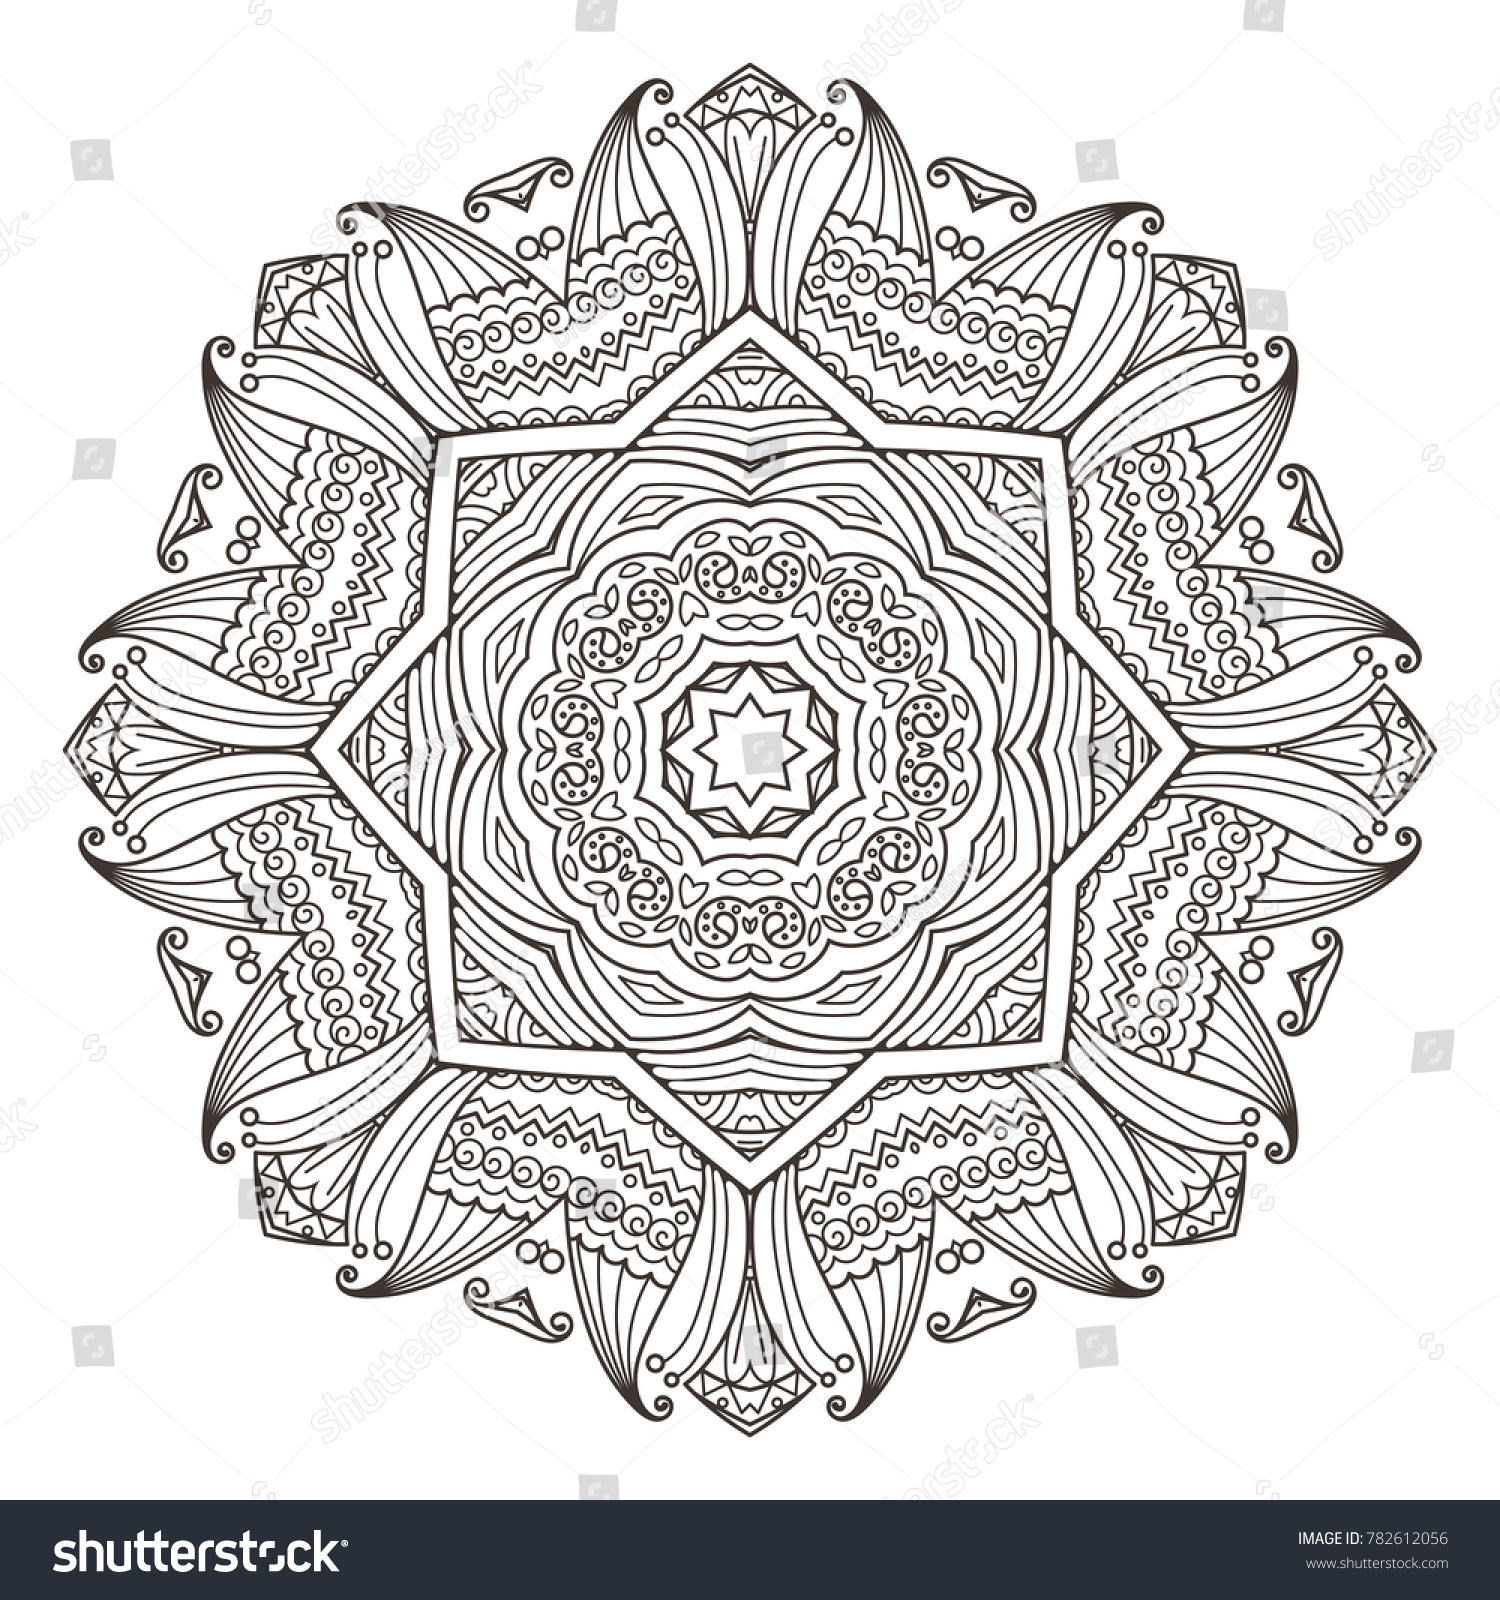 stock vector mandala abstract decorative background islam arabic oriental indian ottoman yoga motifs